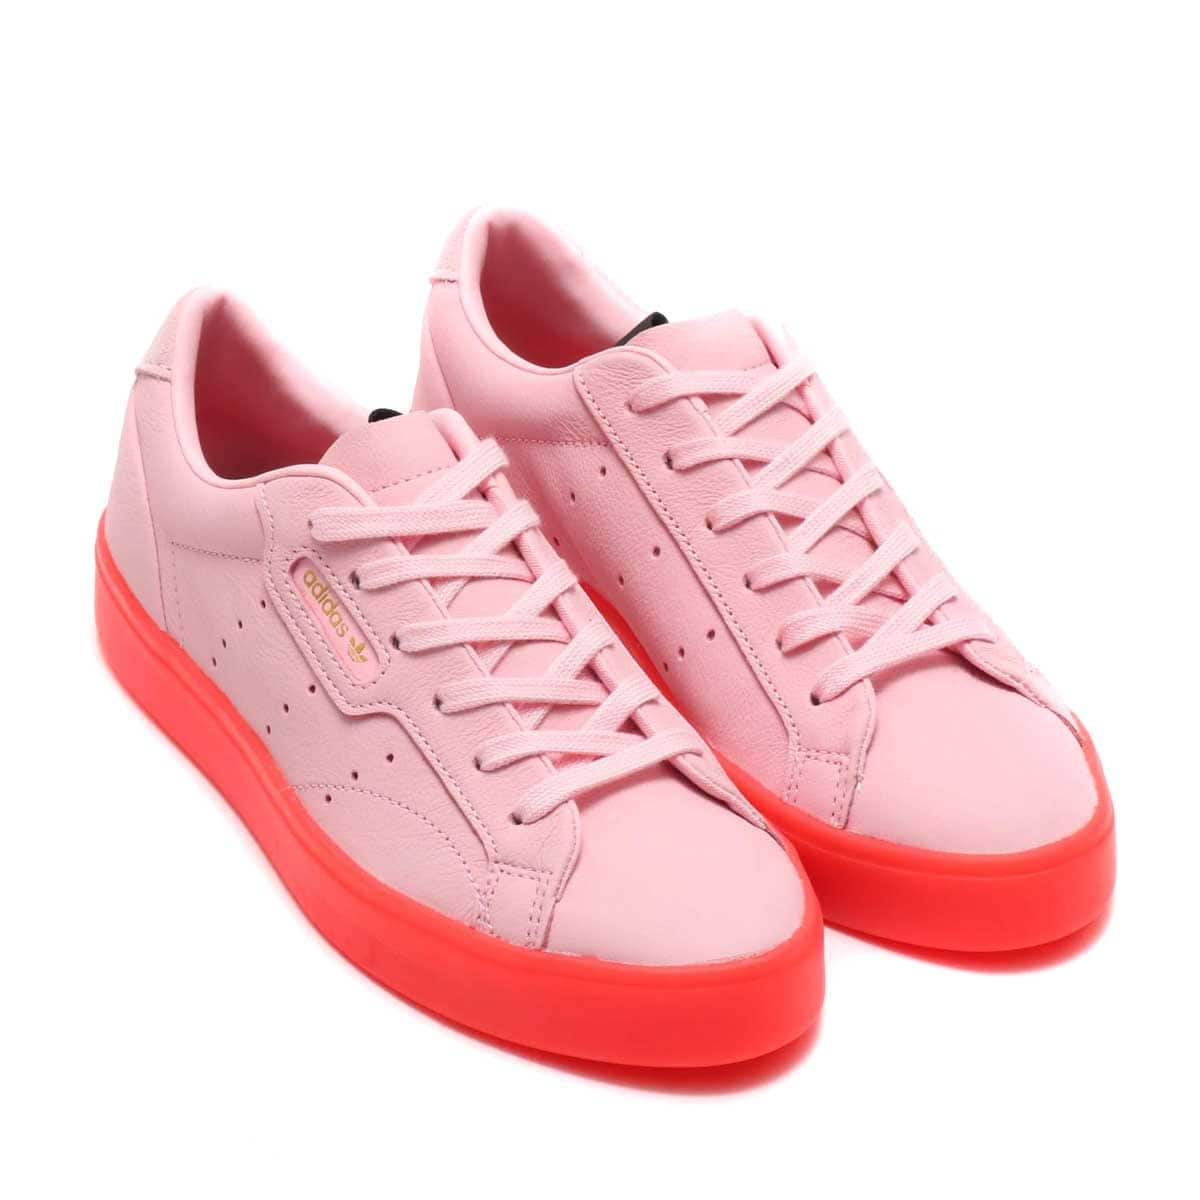 adidas Originals SUPERSTAR SLEEK W DIVA/DIVA/RED 19SS-I_photo_large